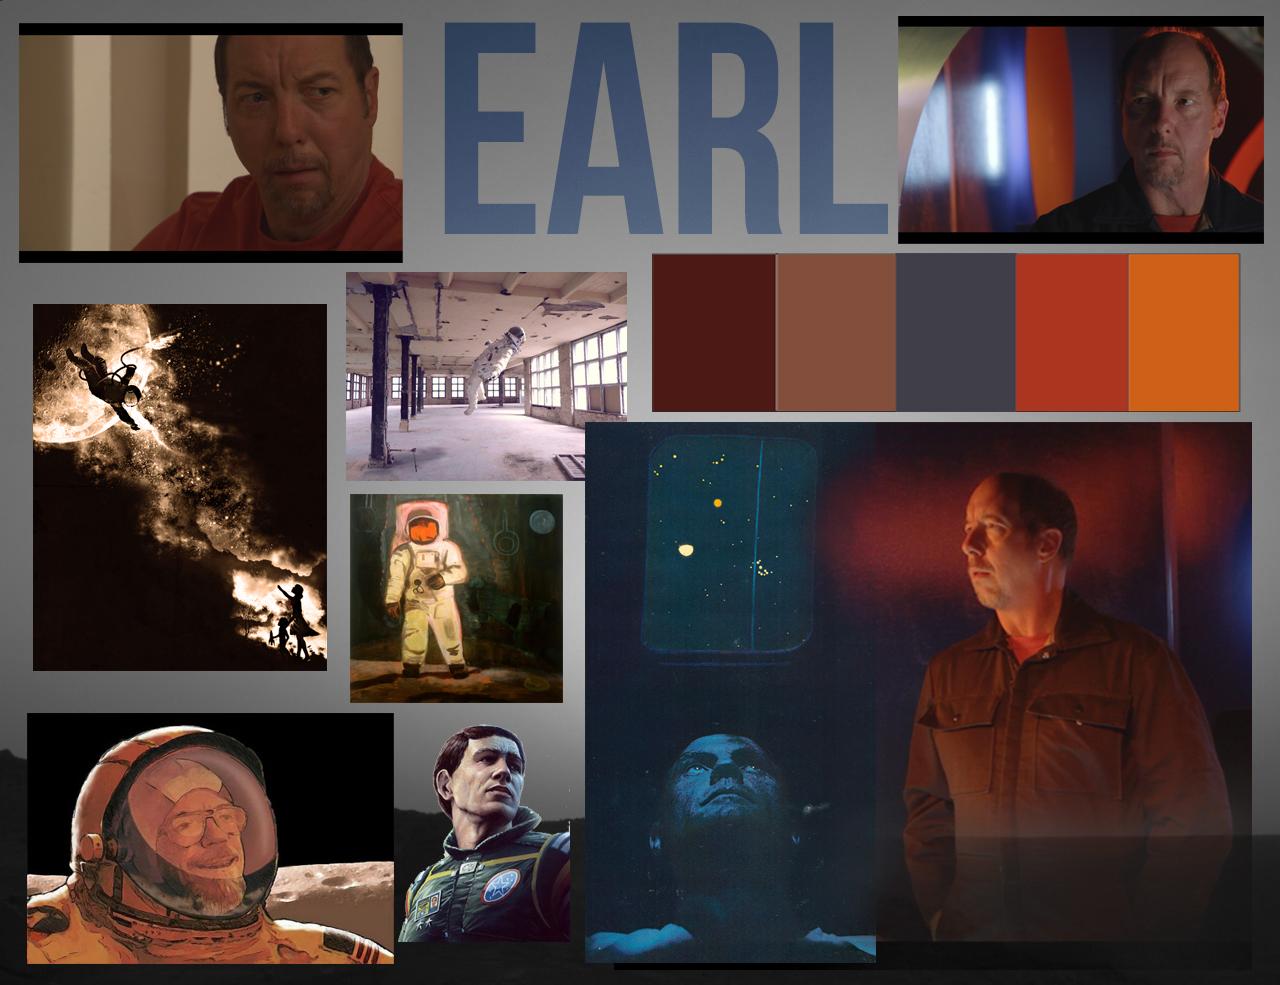 *earl.jpg